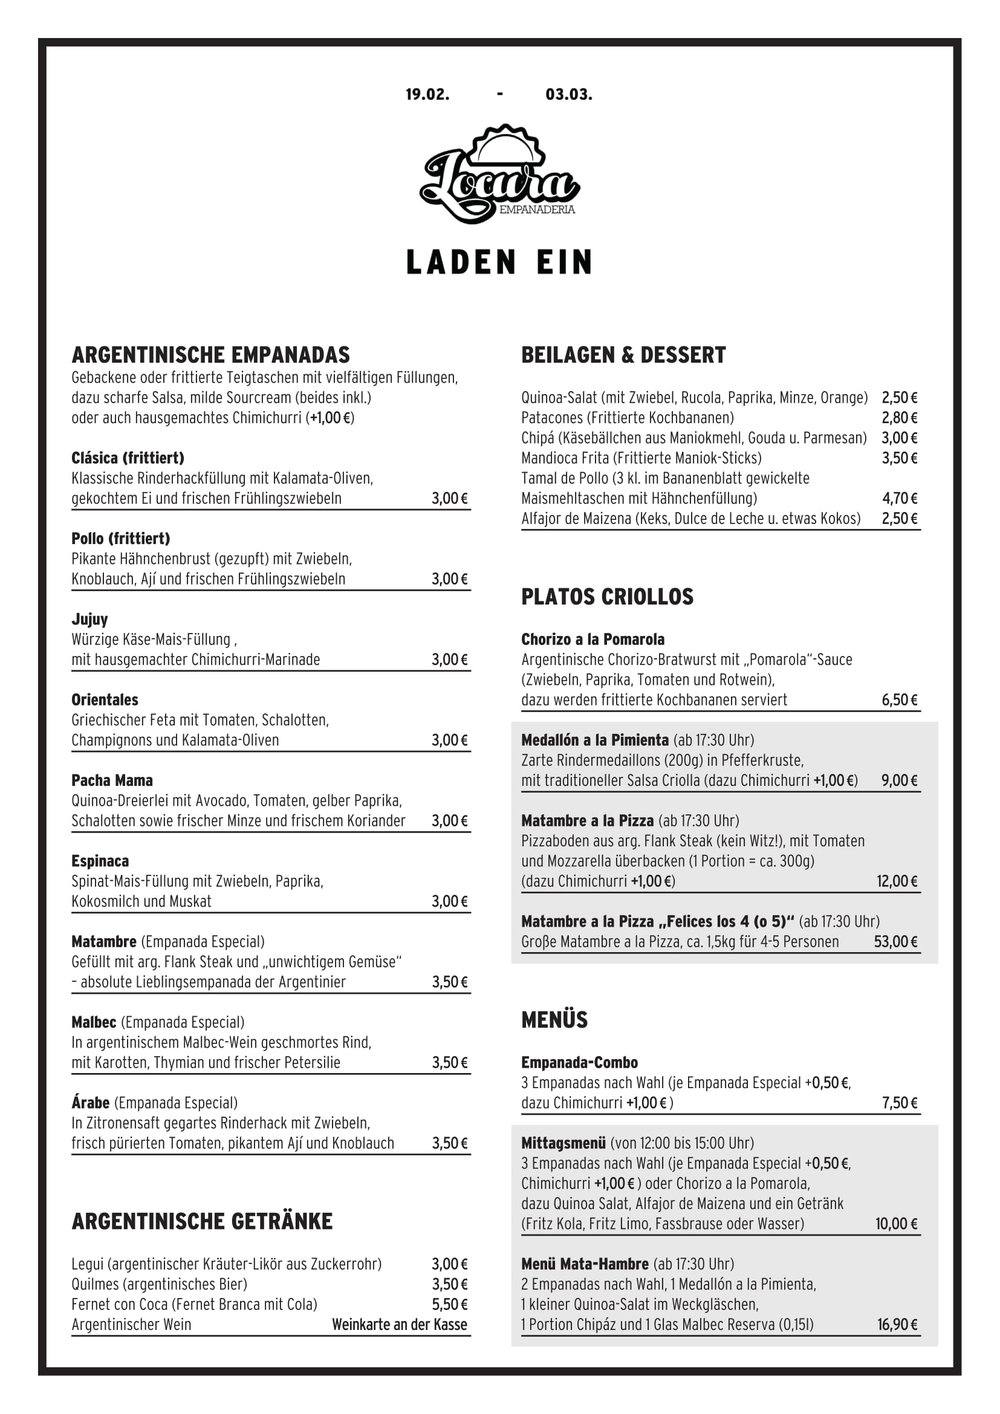 LadenEin-Locura-2_Speisekarte_DINA4-v3-1.jpg